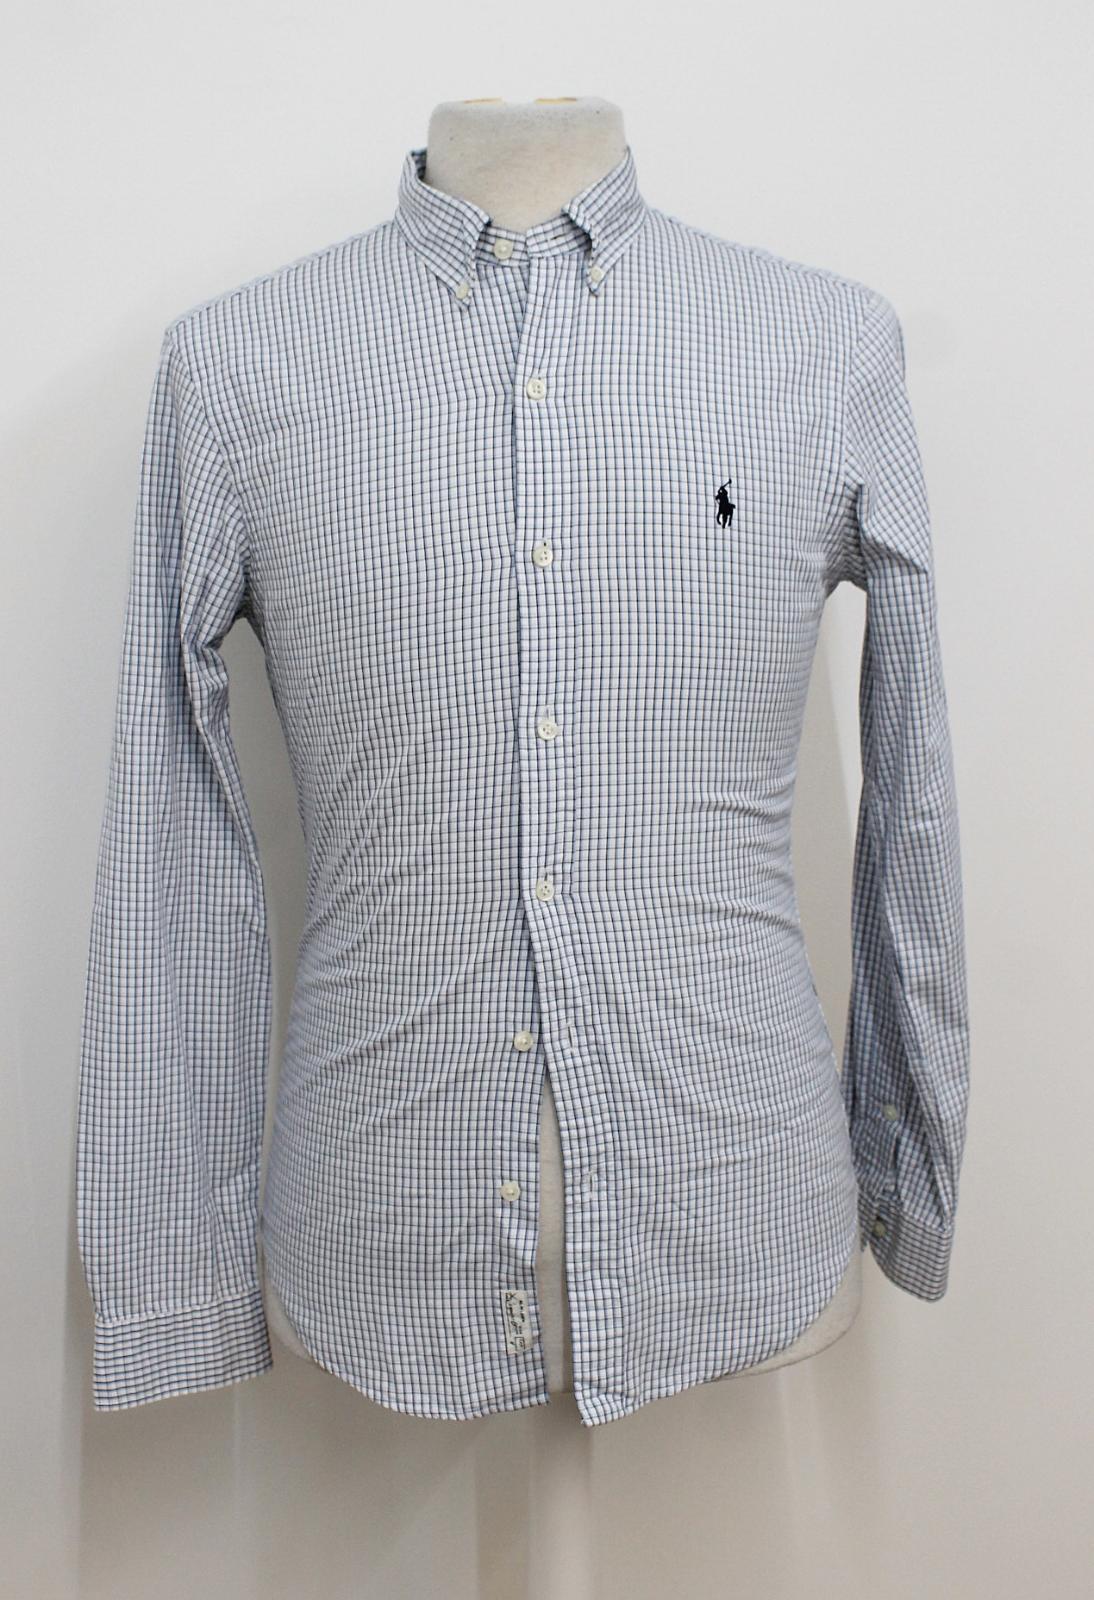 Polo-Ralph-Lauren-Para-Hombres-Blanco-Negro-Azul-Camisa-De-Patron-De-Cuadros-Slim-Fit-Talla-S miniatura 2